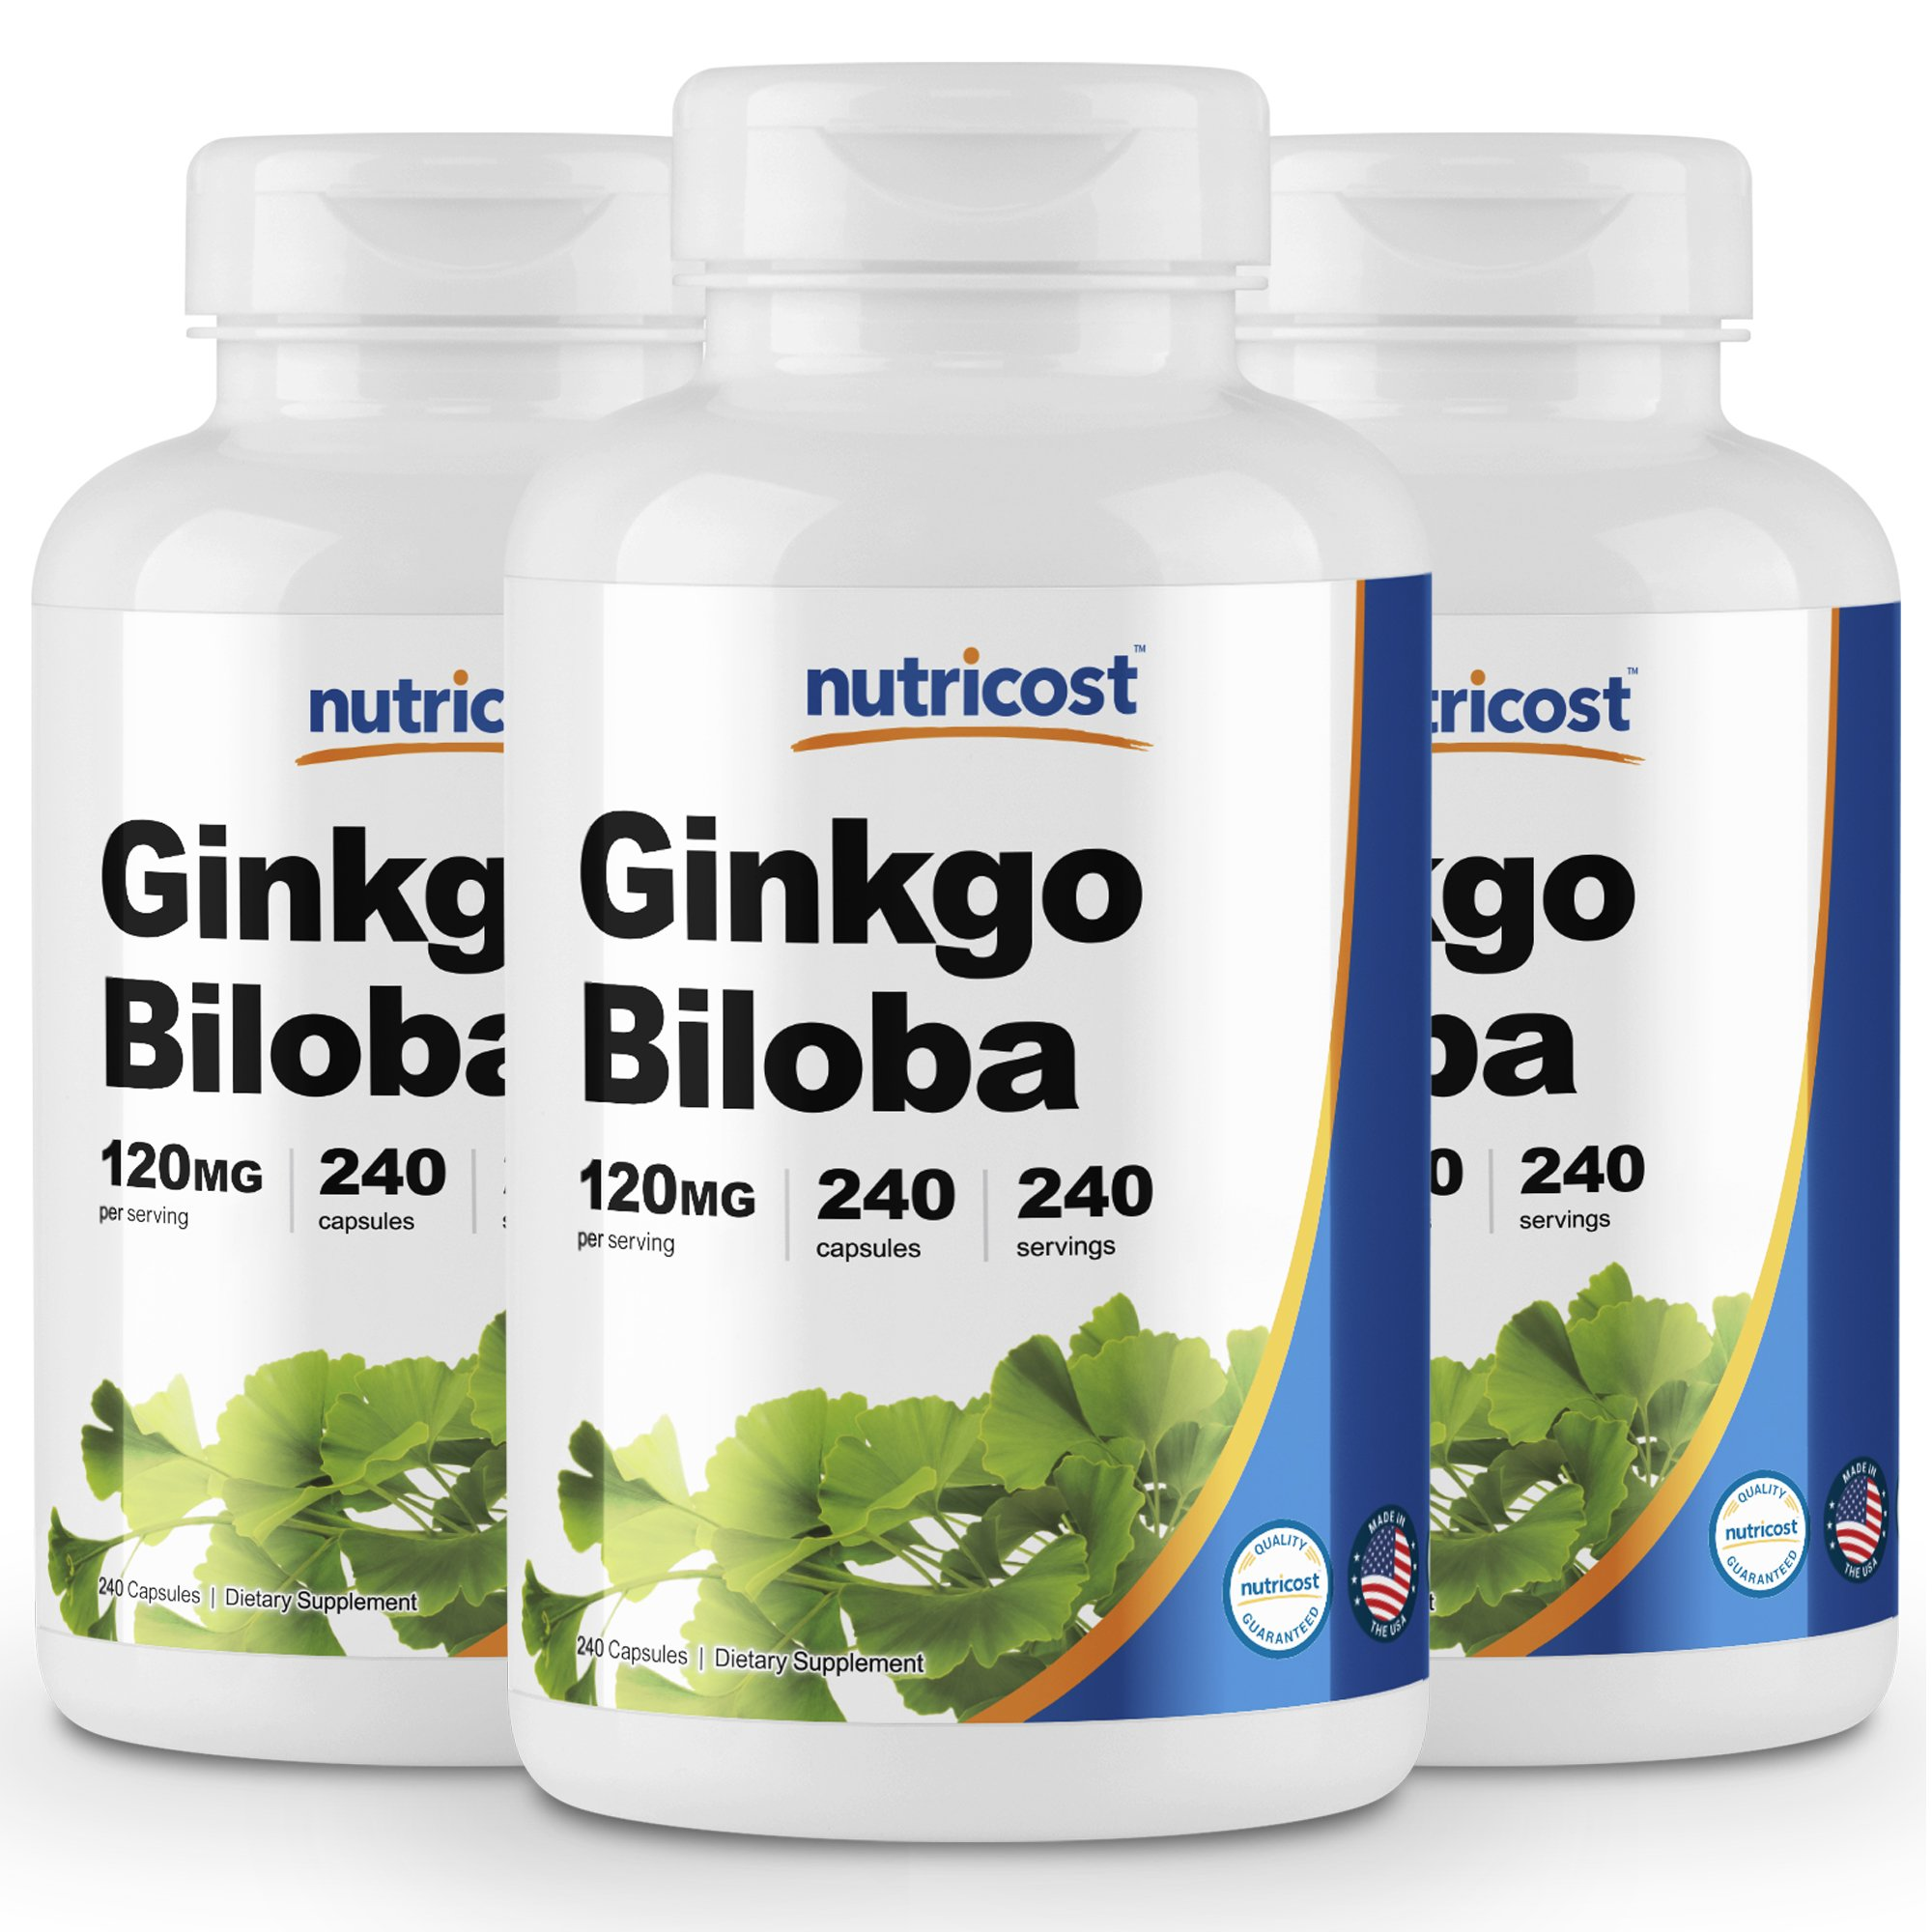 Nutricost Ginkgo Biloba 120mg; 240 Capsules (3 Bottles)